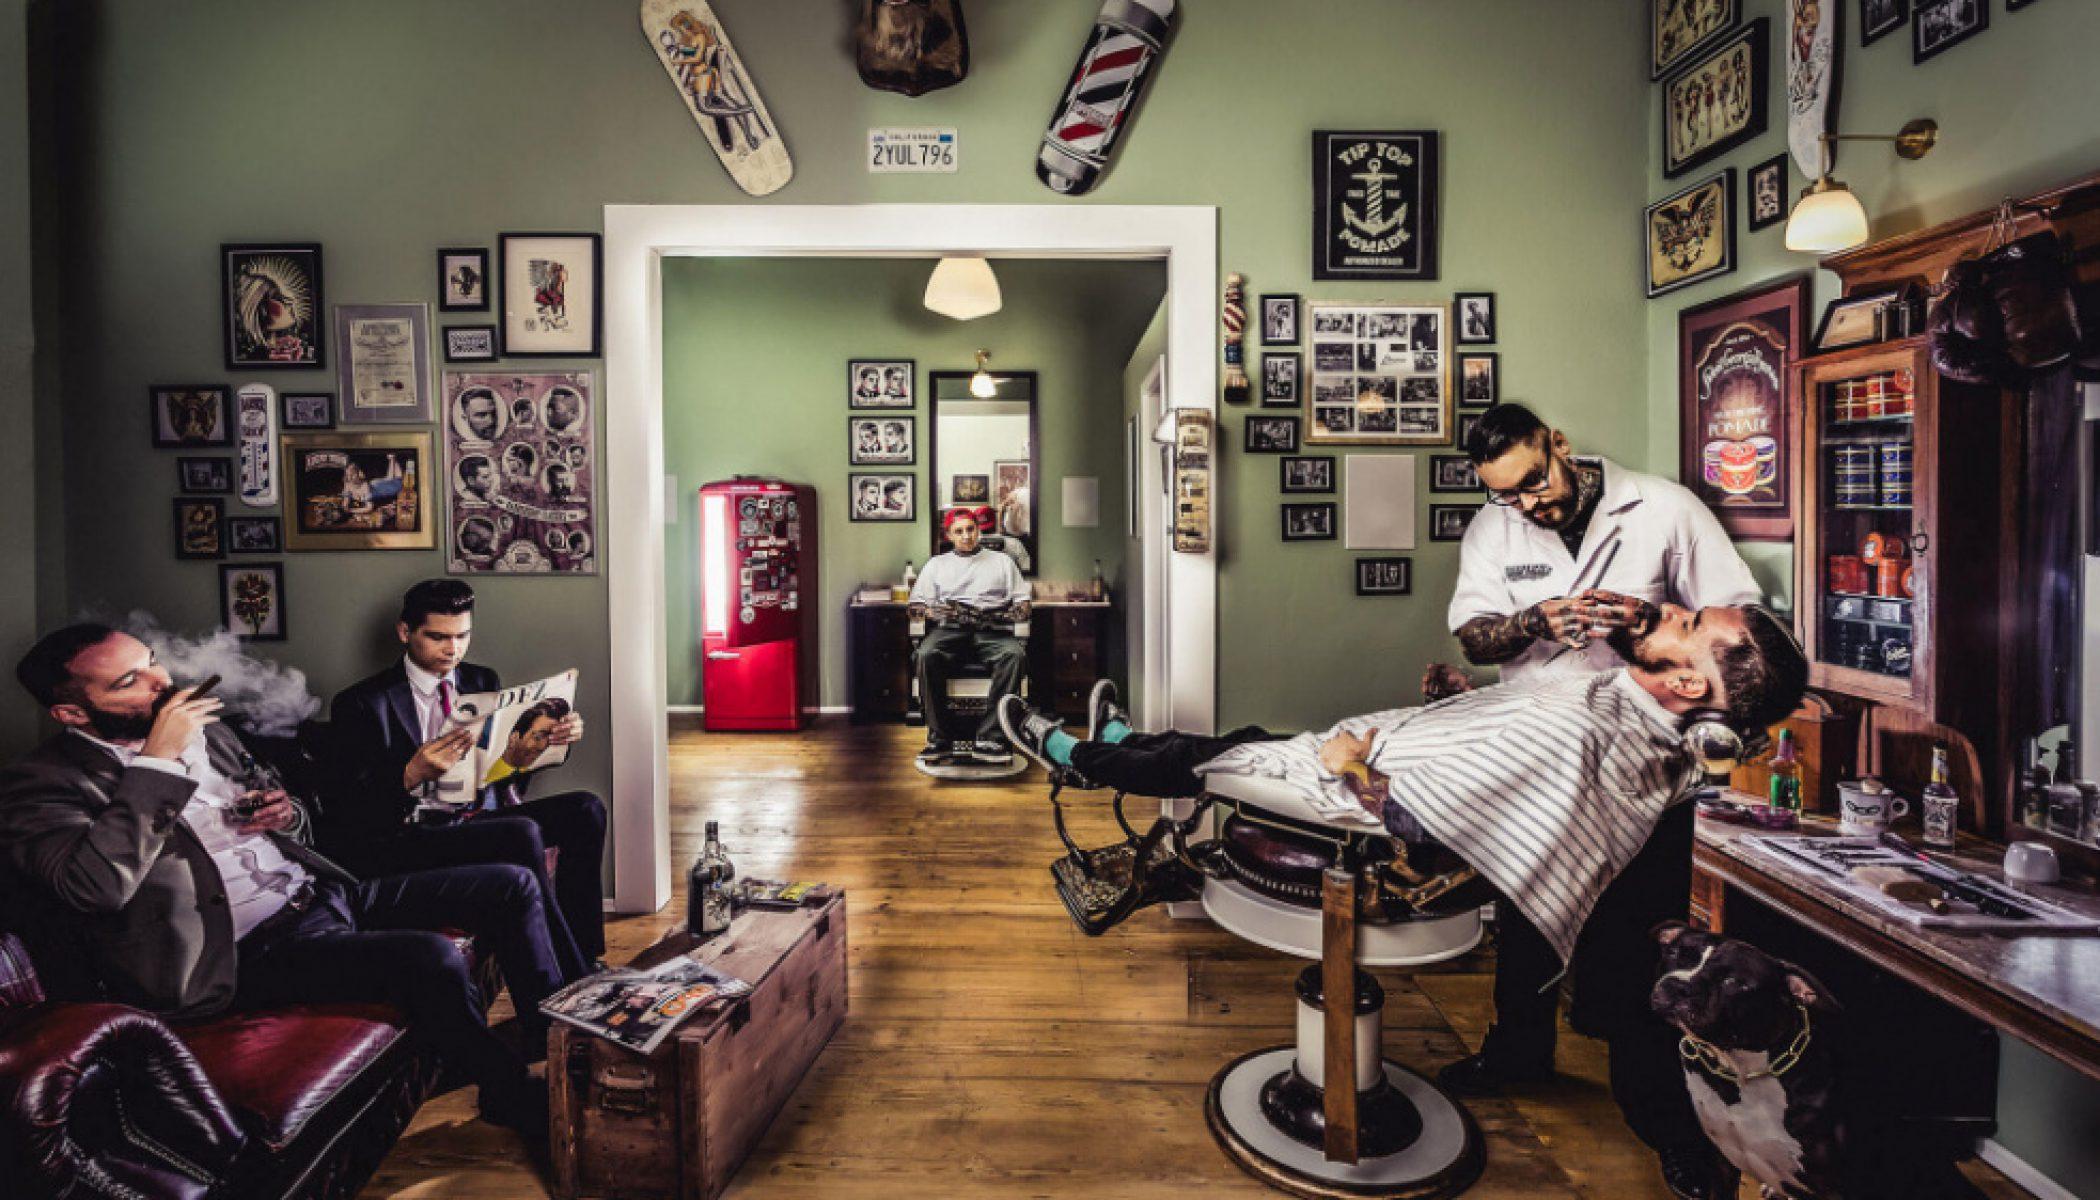 chto takoe barbershopy